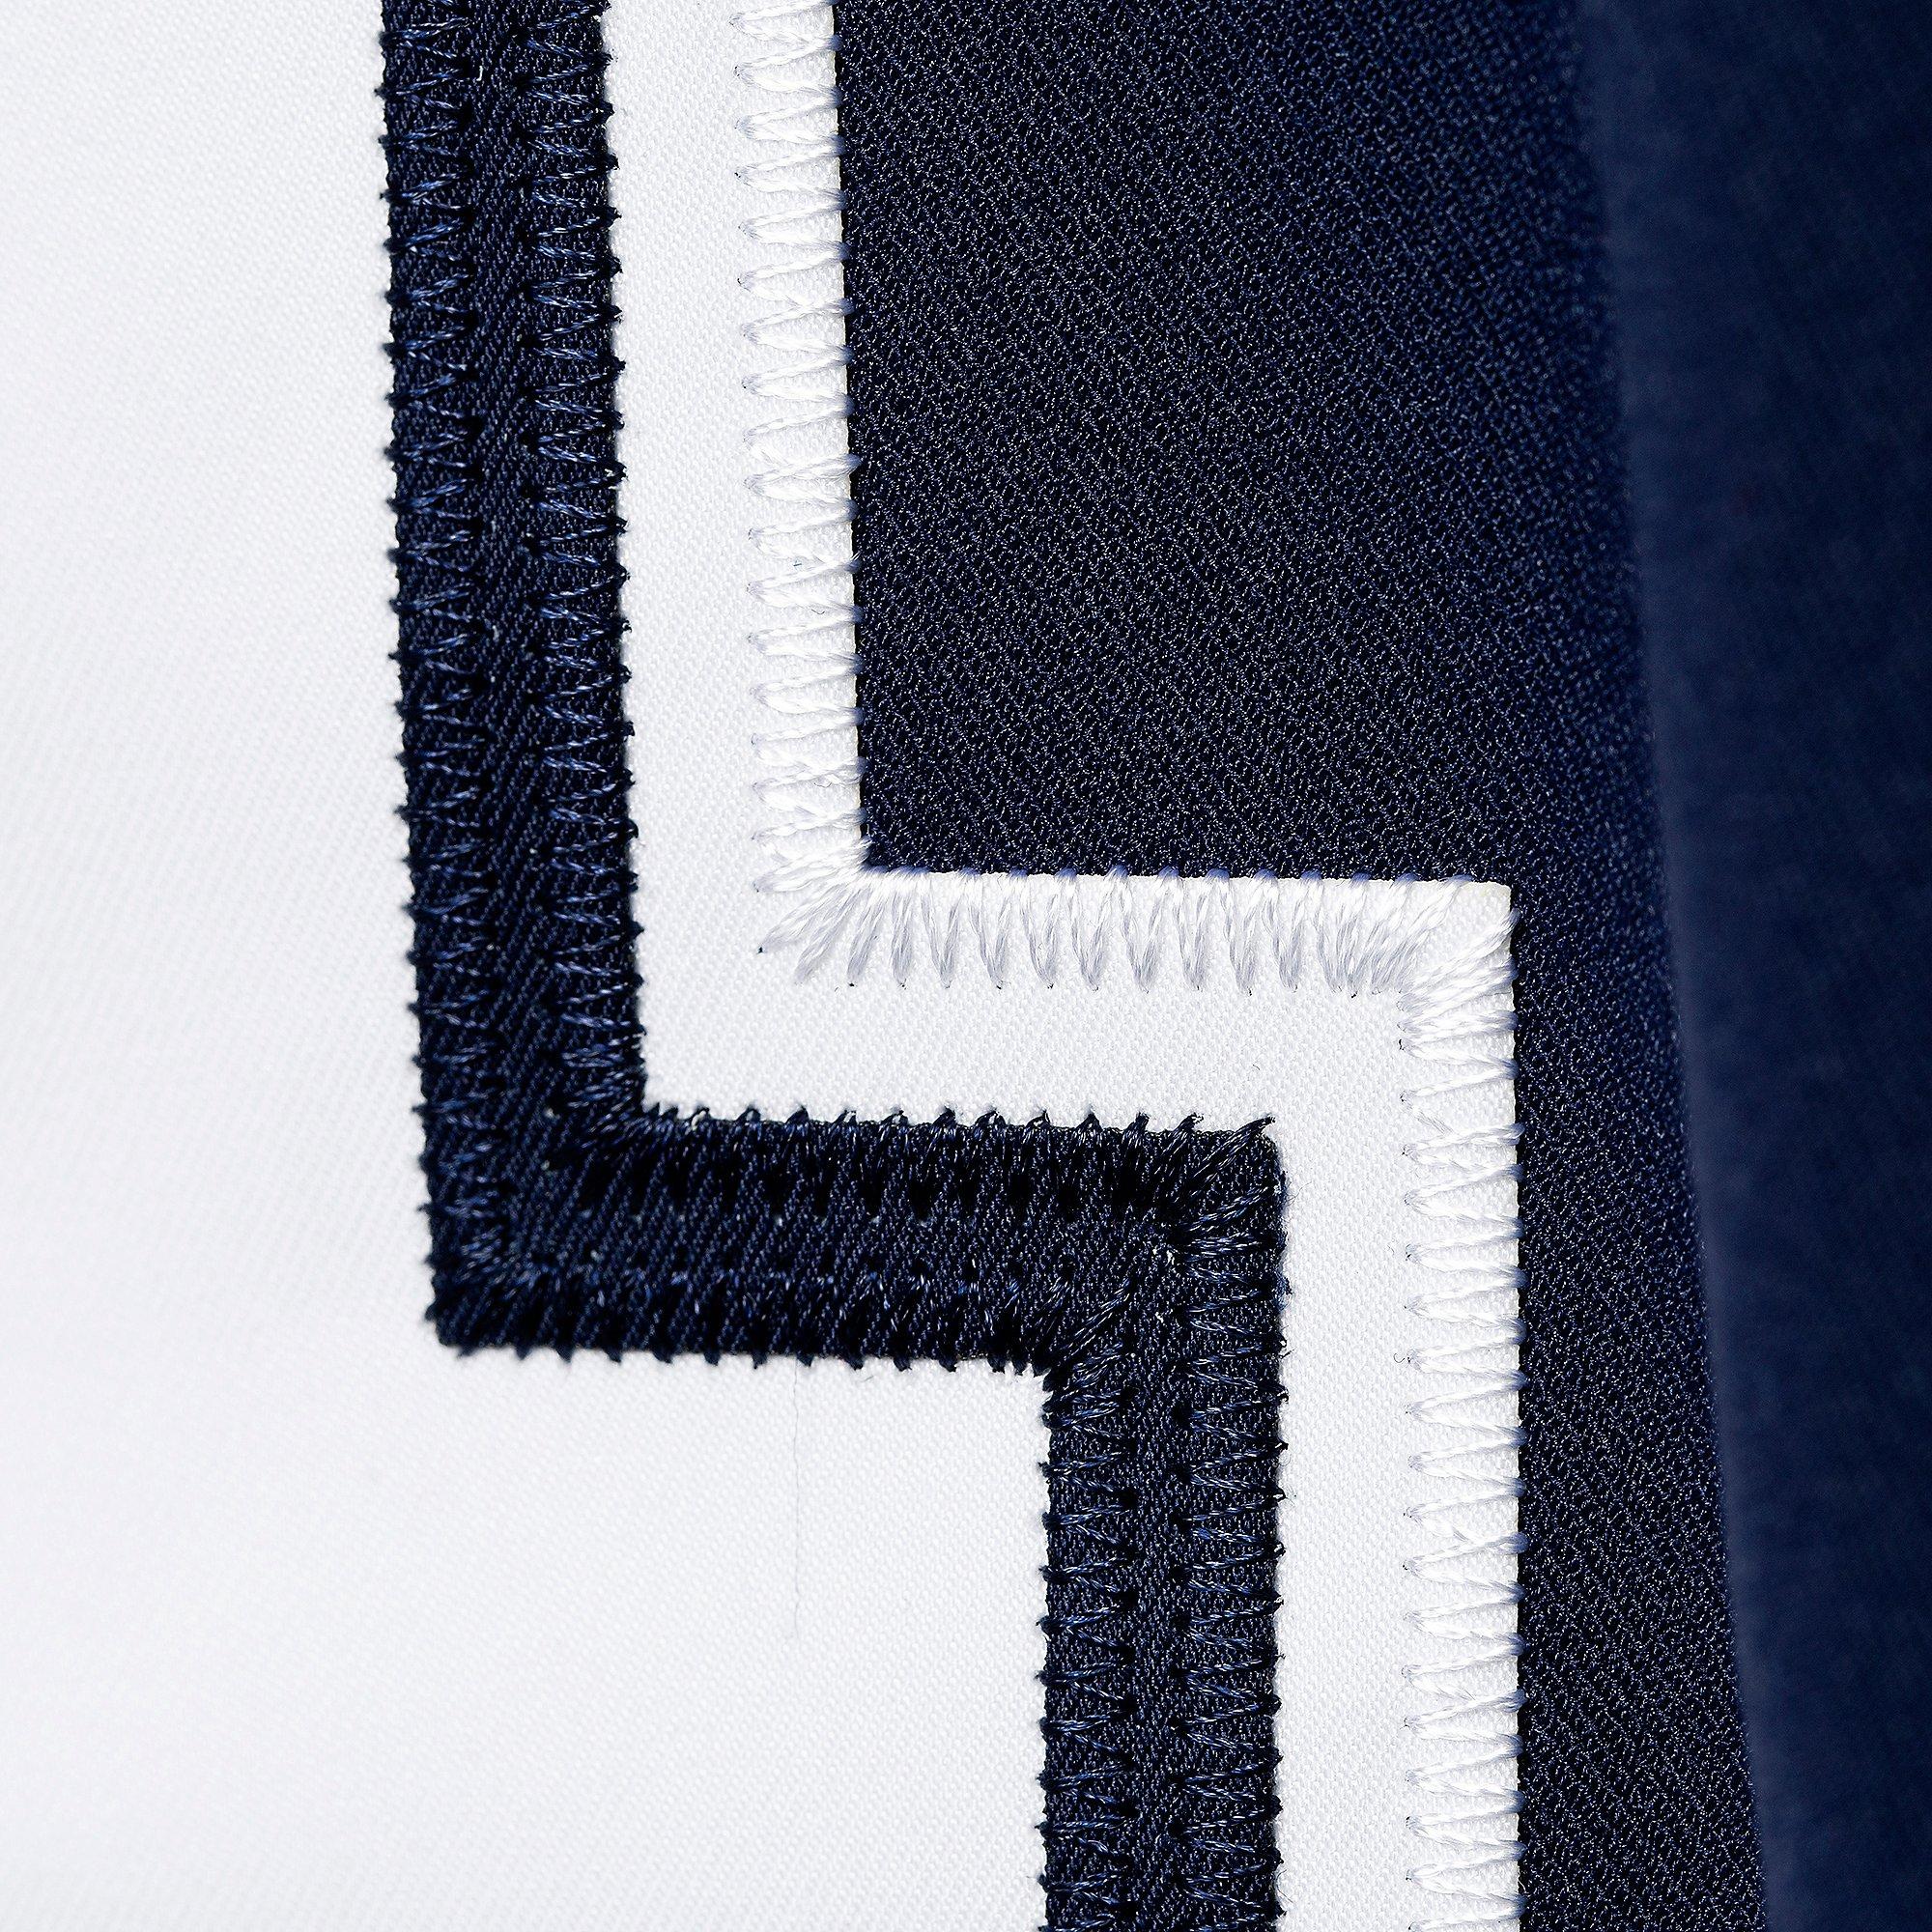 ezekiel elliott authentic jersey